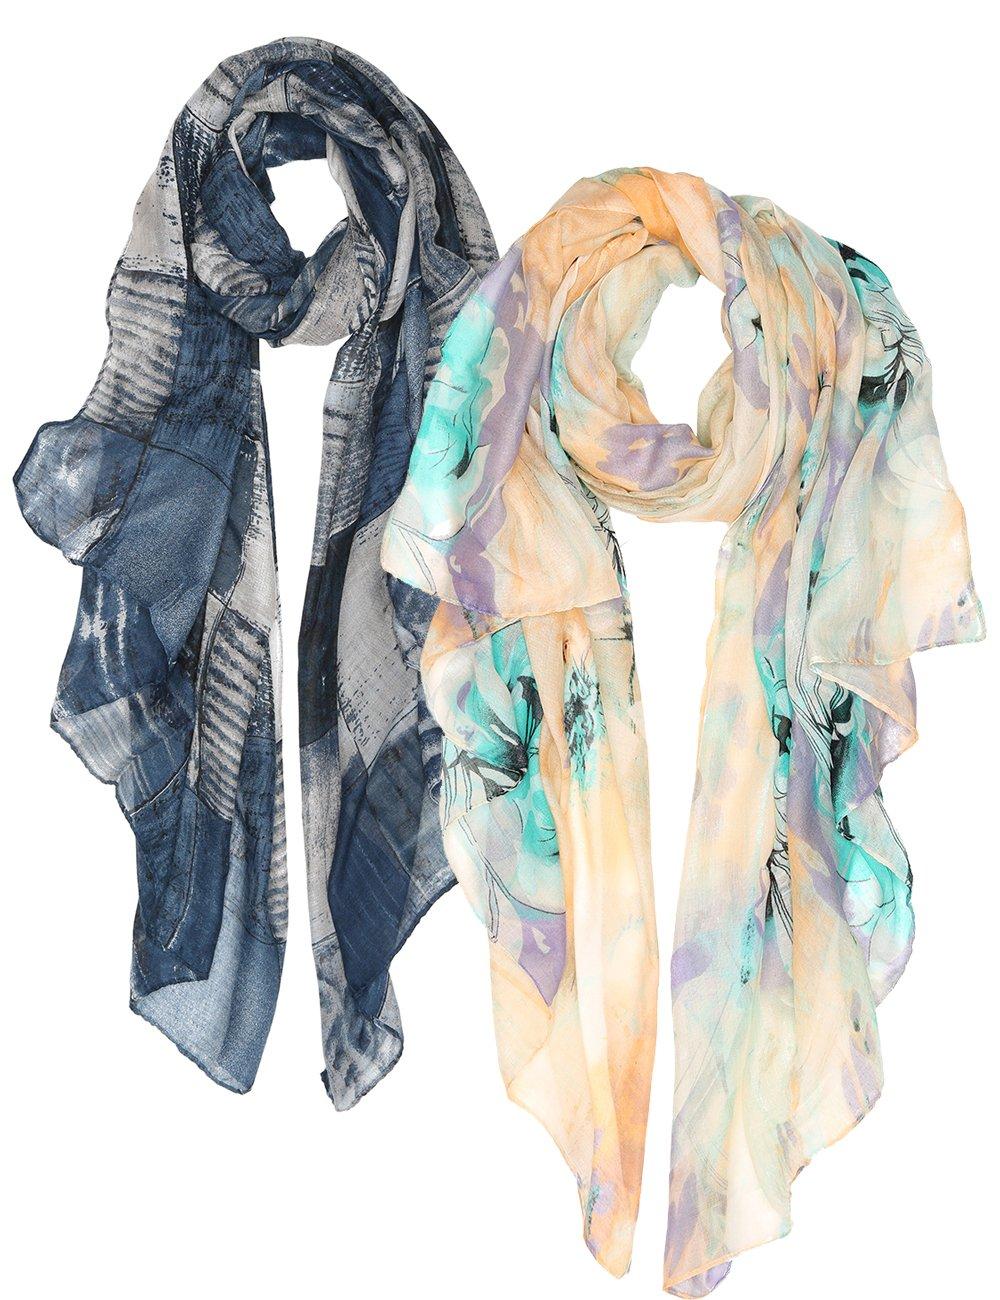 Women Lightweight Fashion Spring Scarves Shawl Wraps (2PACK-212)